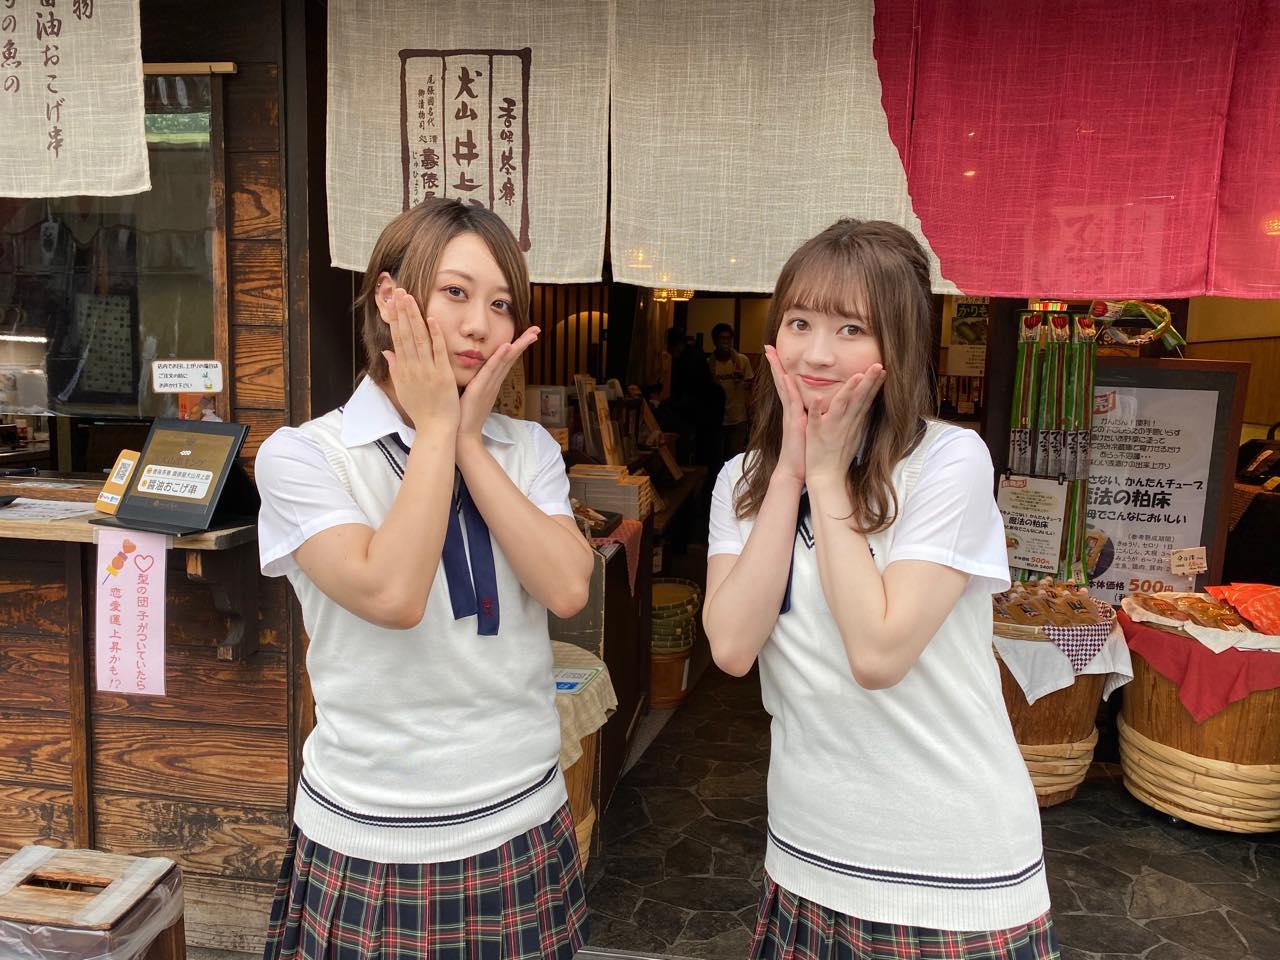 「SKE48は君と歌いたい」江籠裕奈&古畑奈和が愛知県犬山市を訪れる②